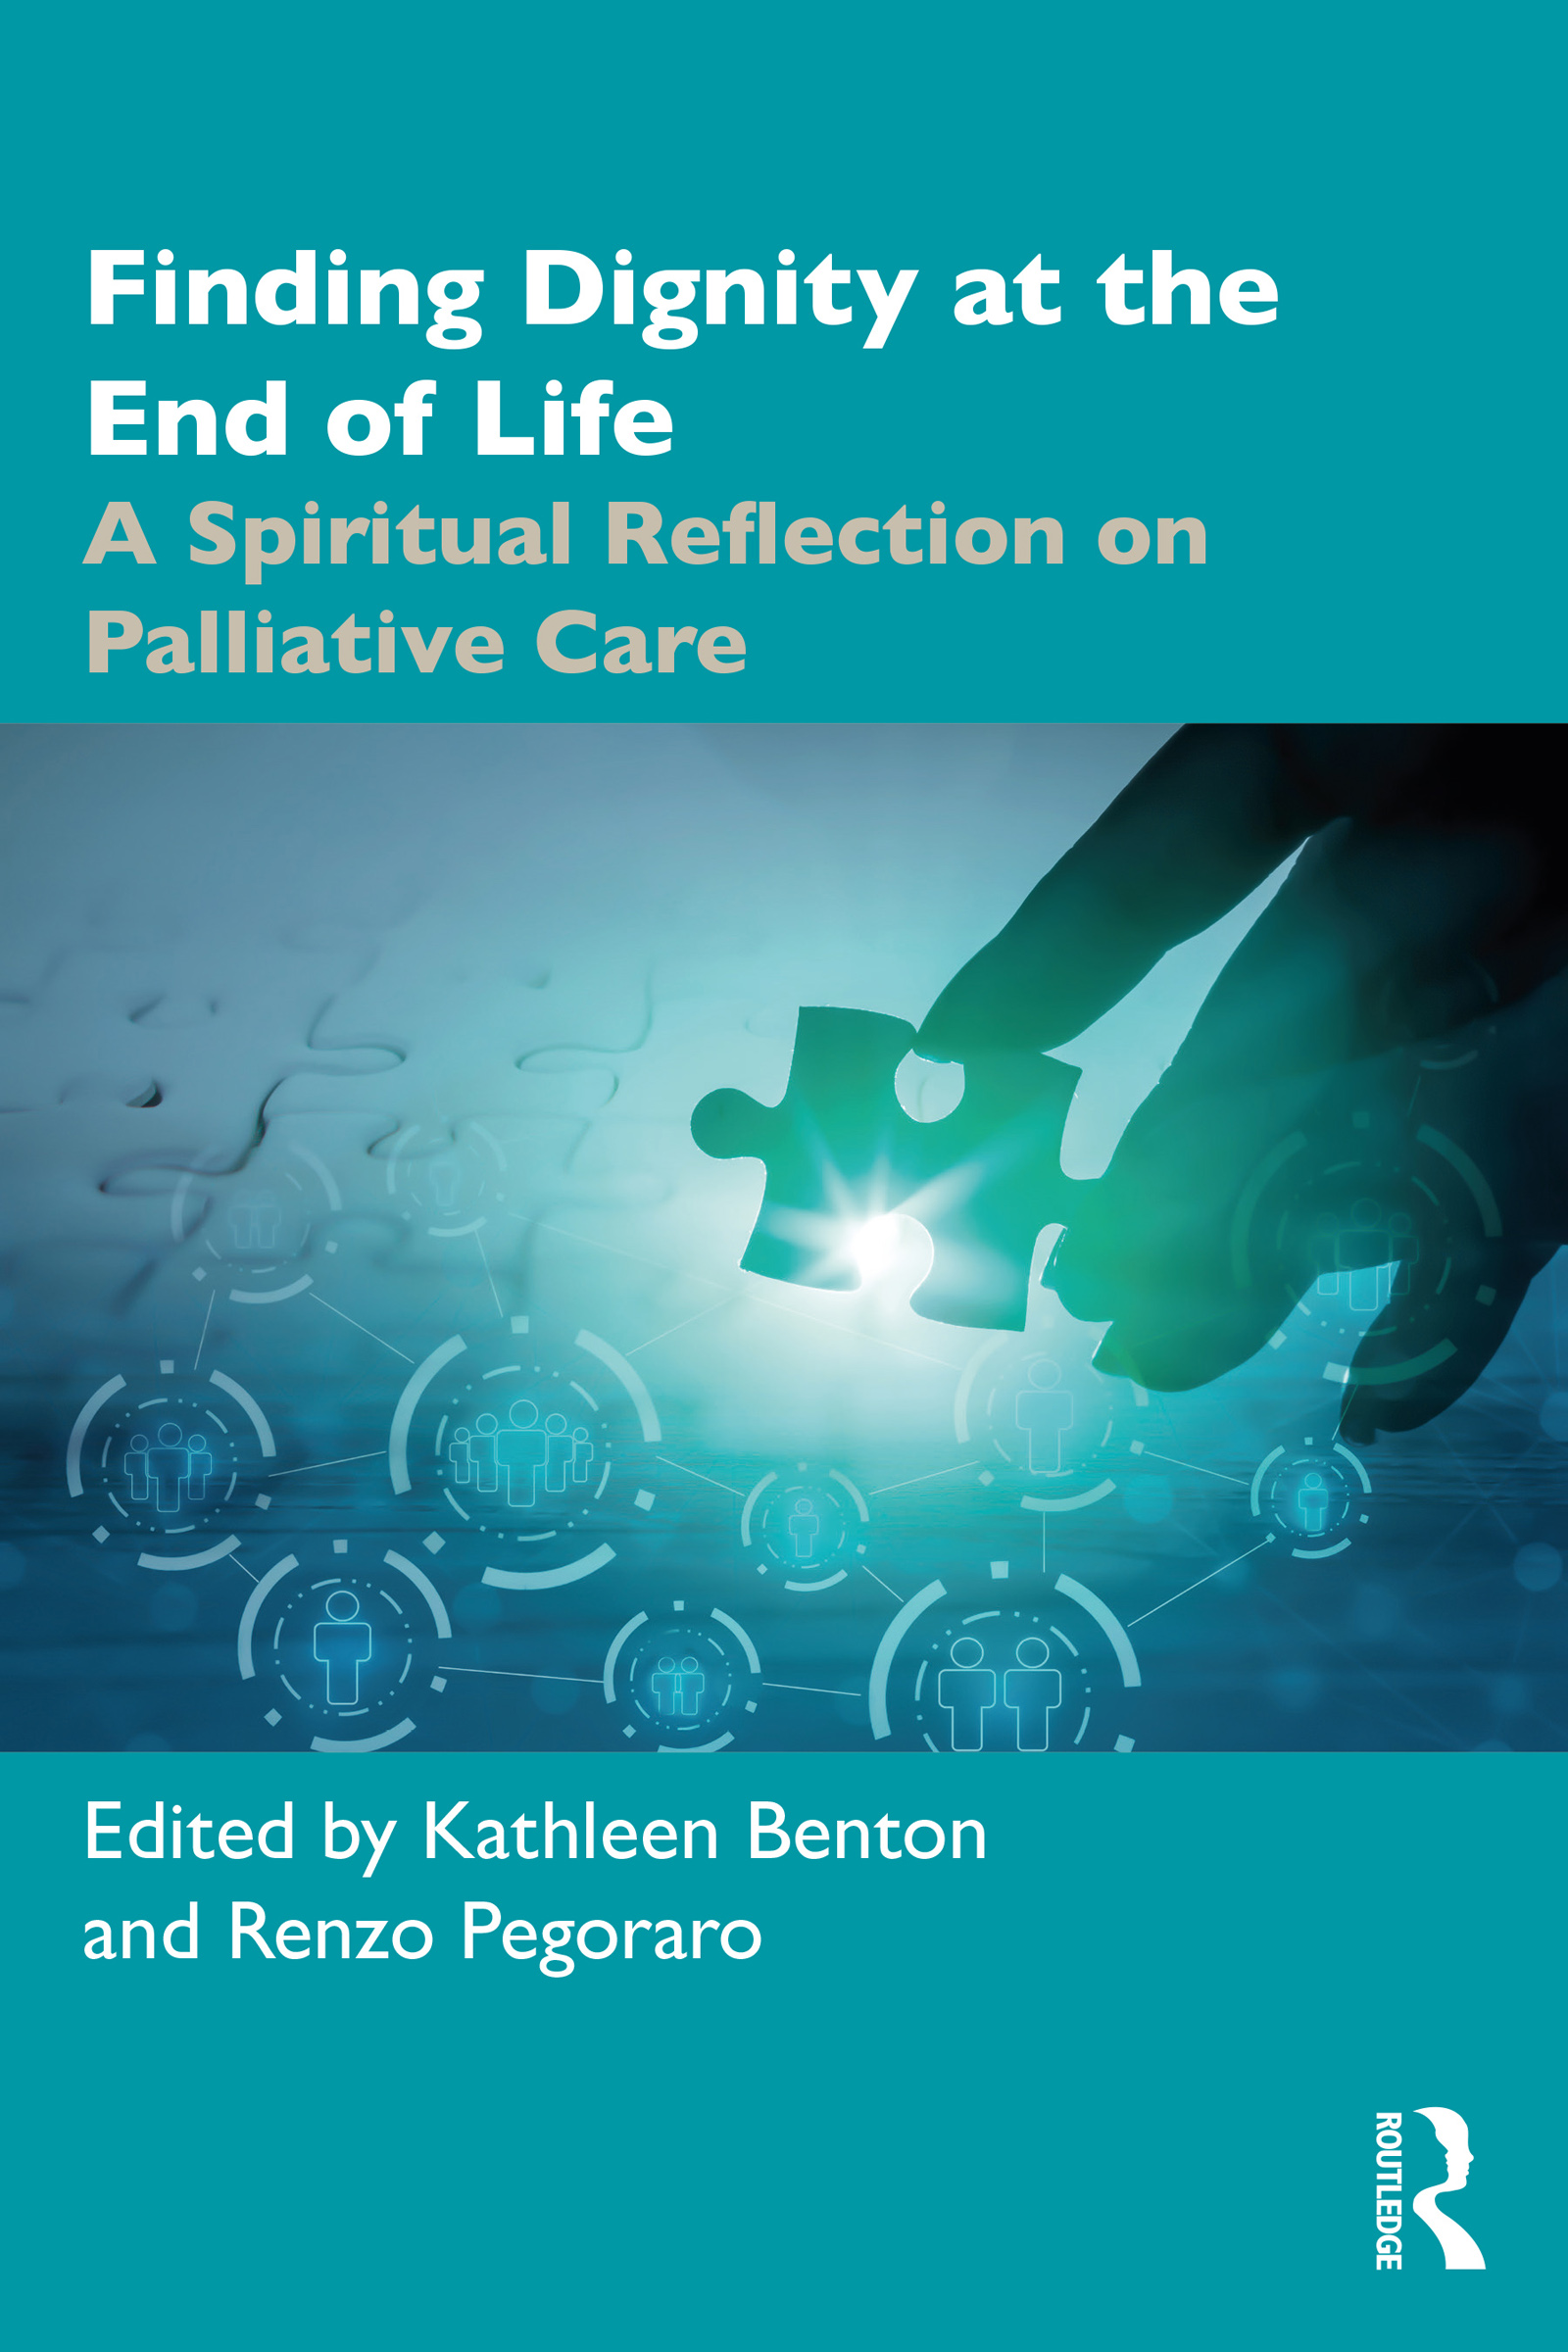 International Palliative Care Advocacy